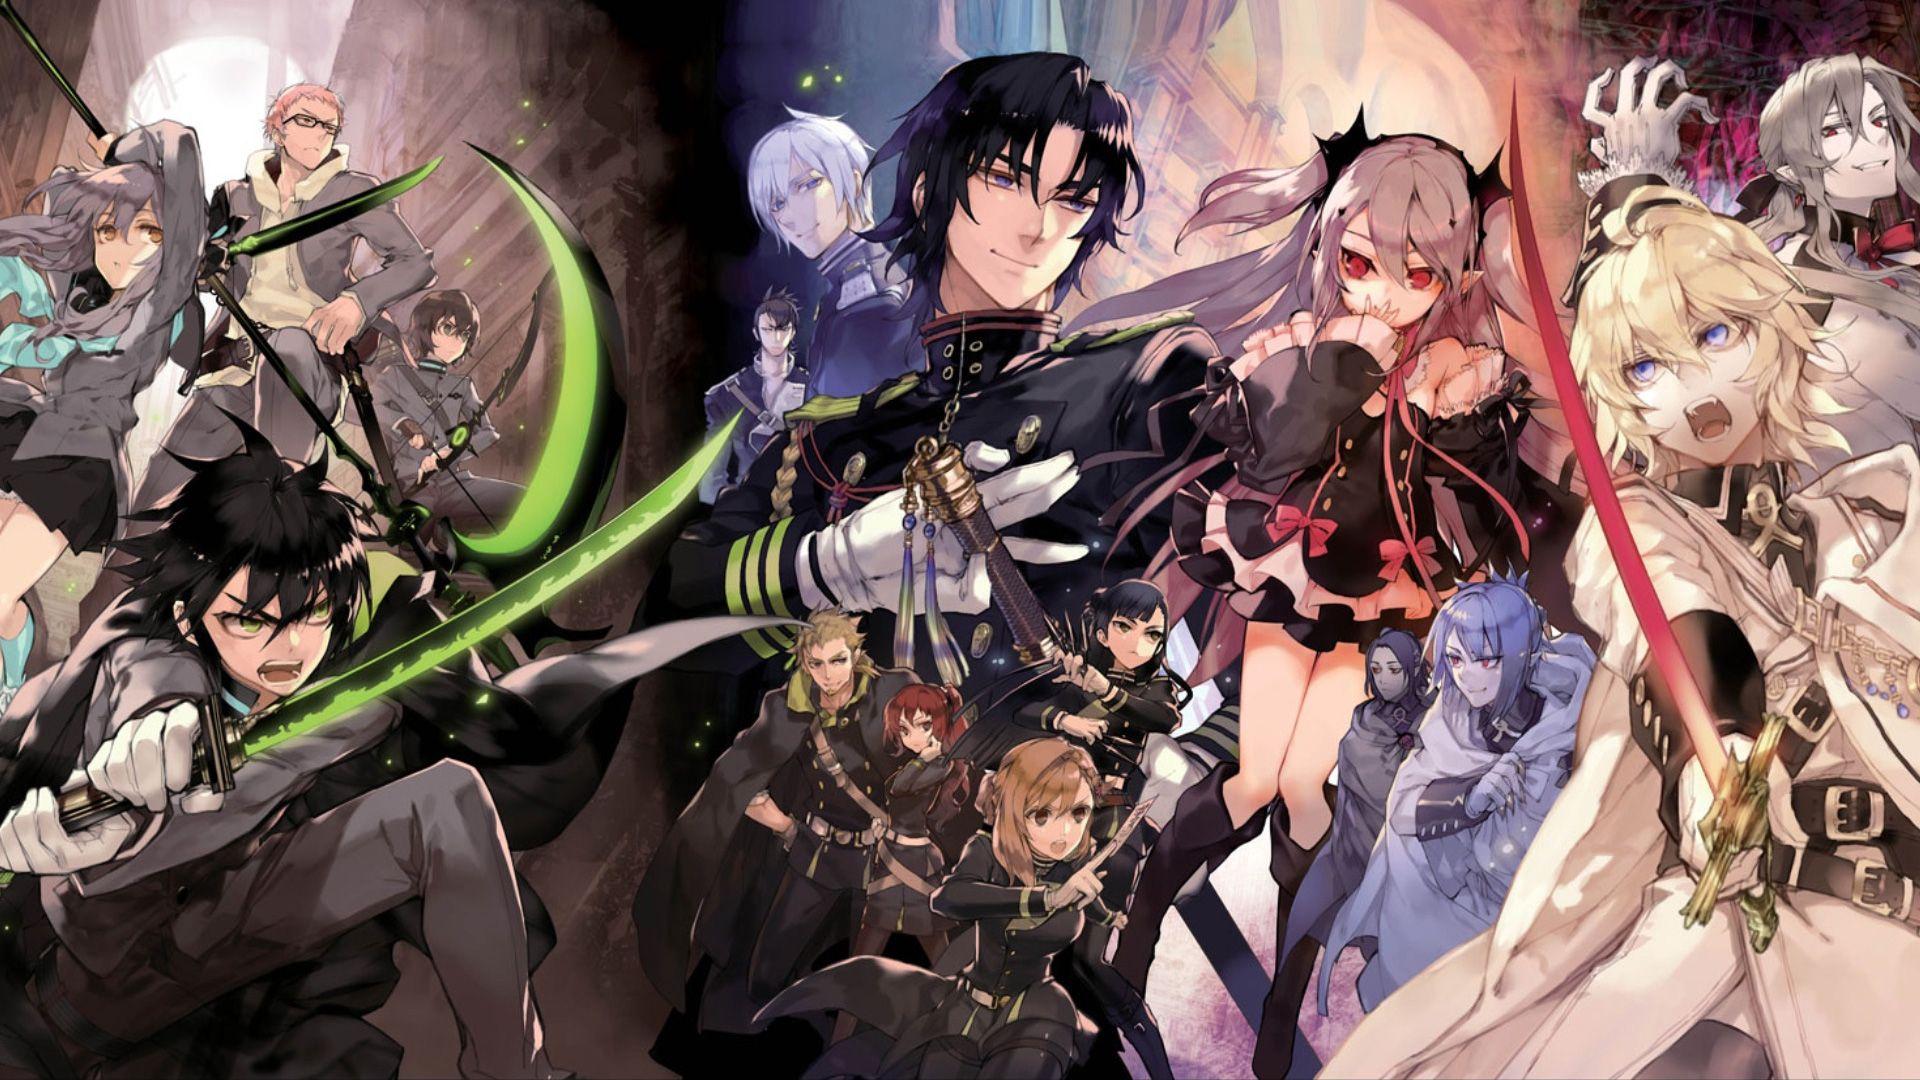 Owari no Seraph Drama Vampire Anime Wallpaper Seraph of